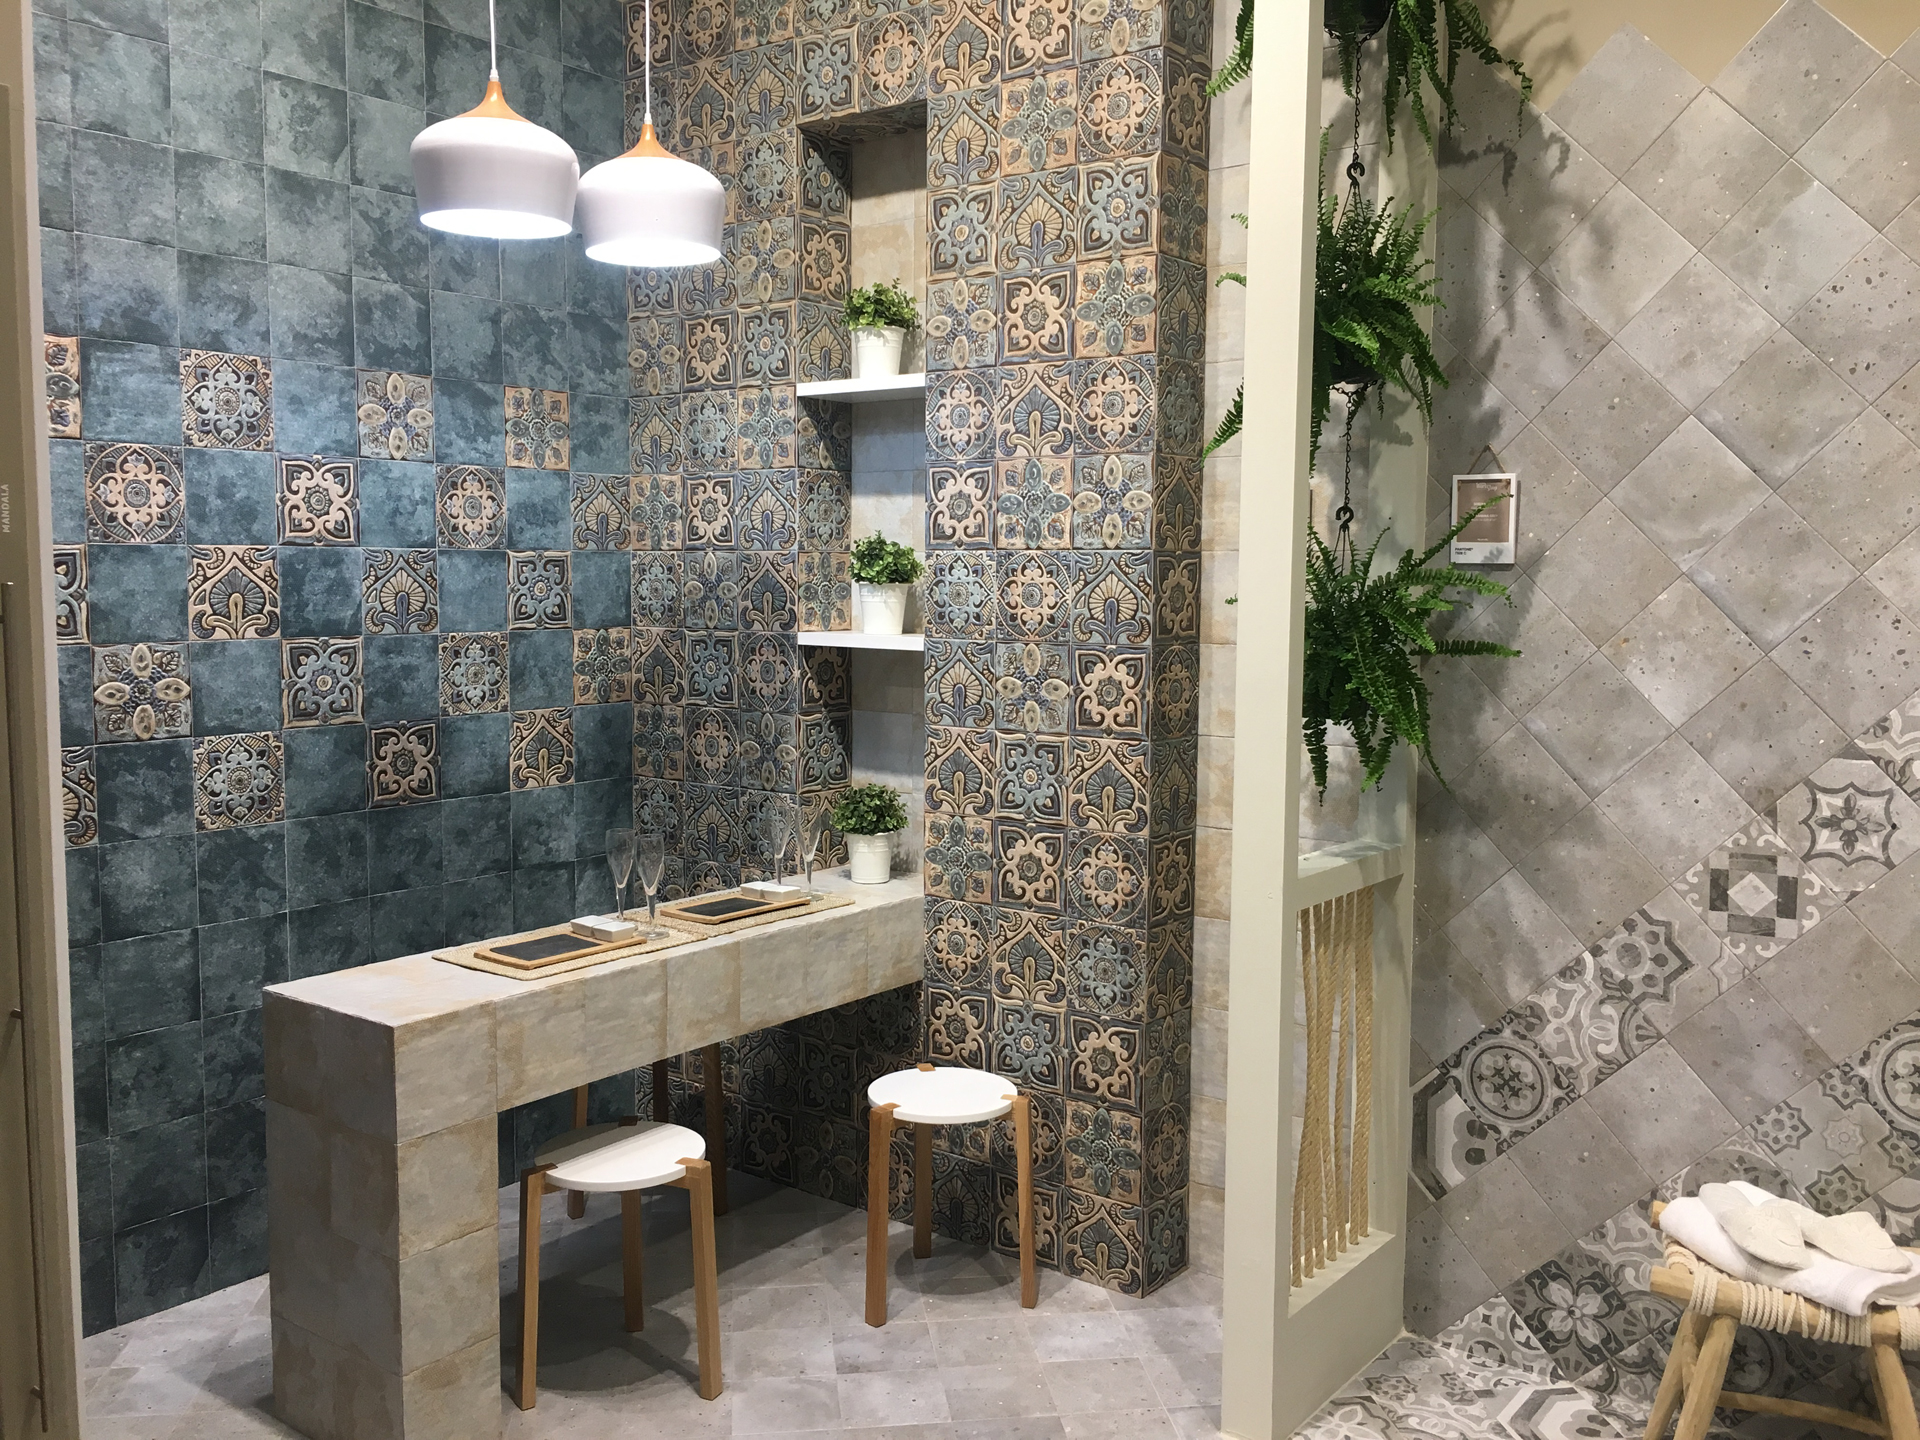 feria-cevisama-valencia-2018-decoracion-interiorismo-14